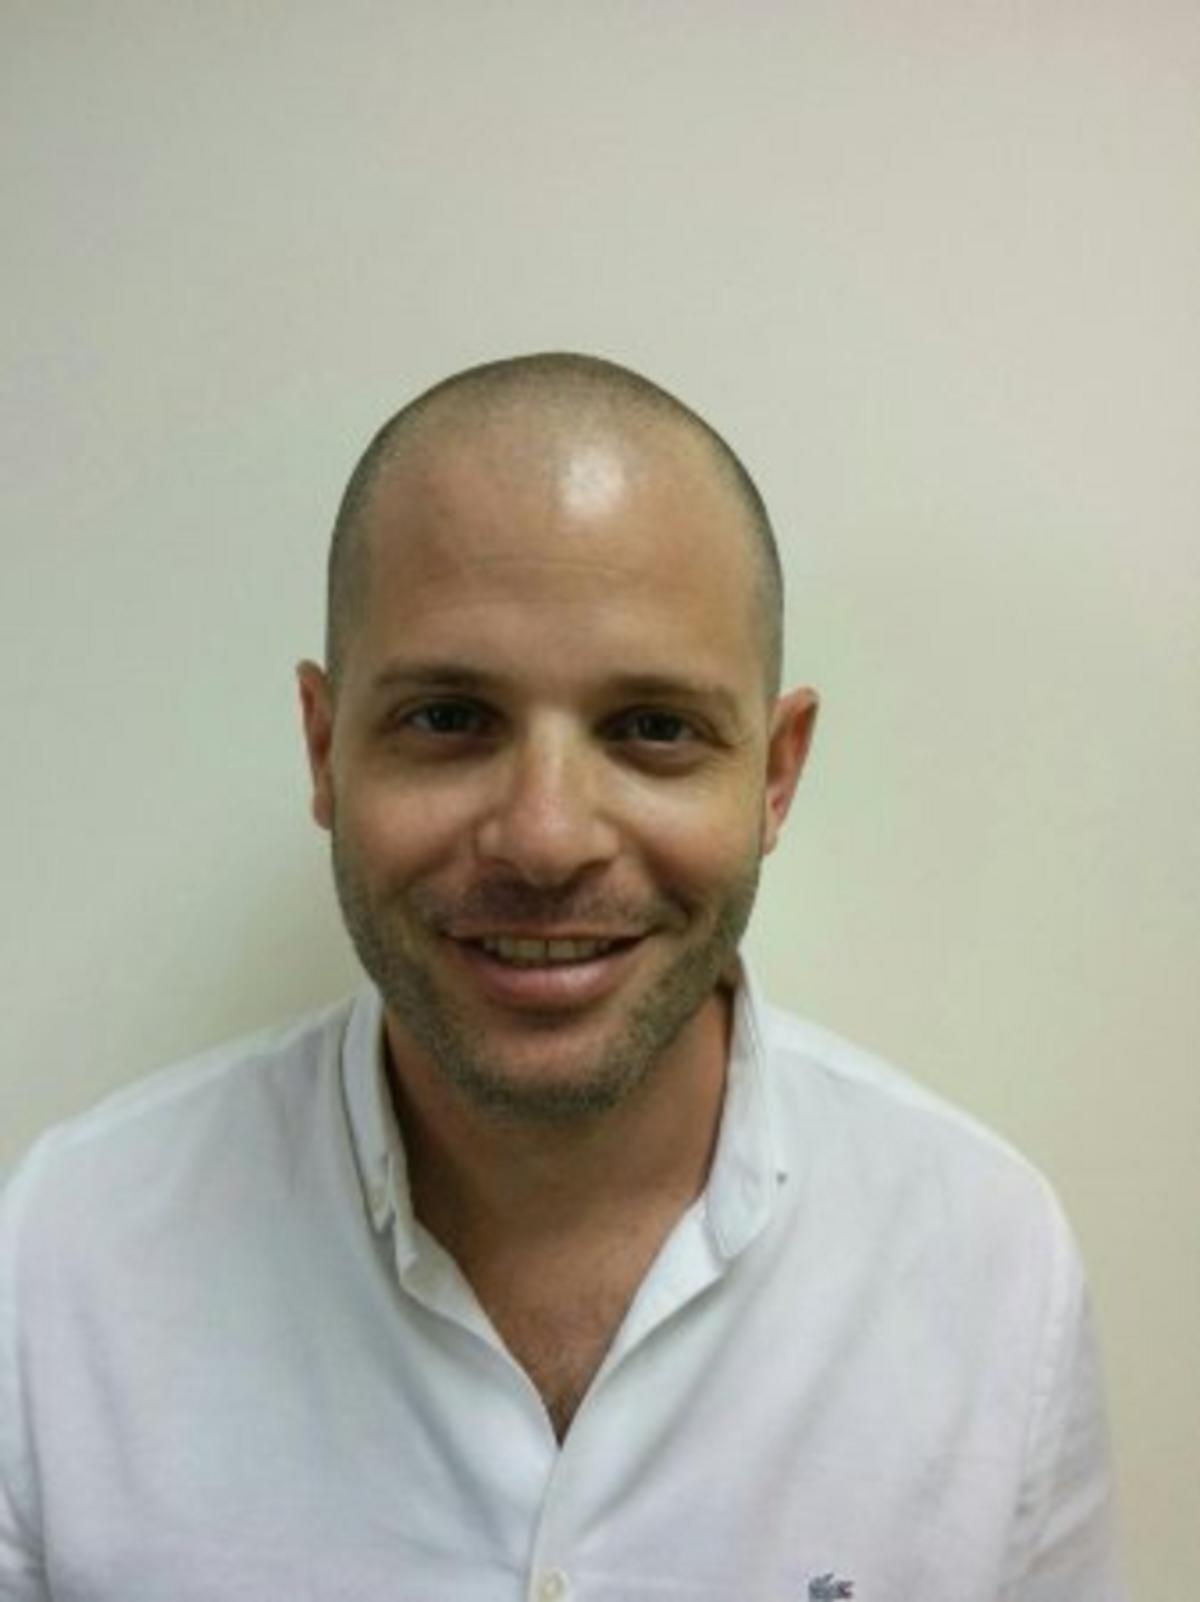 Photo of Ran Regev, Managing Partner at Ortam Holdings